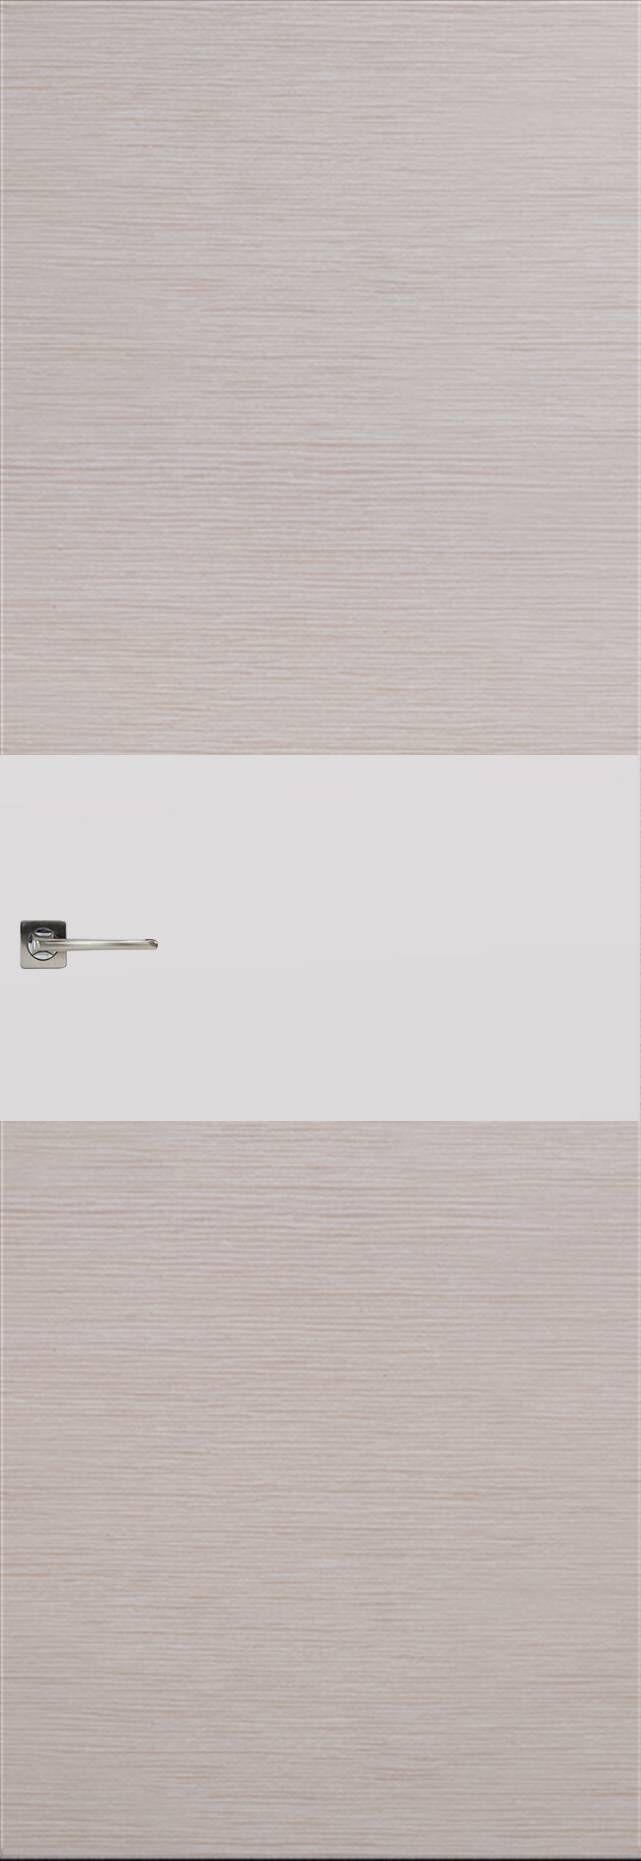 Tivoli Е-4 Invisible цвет - Дымчатый дуб Без стекла (ДГ)